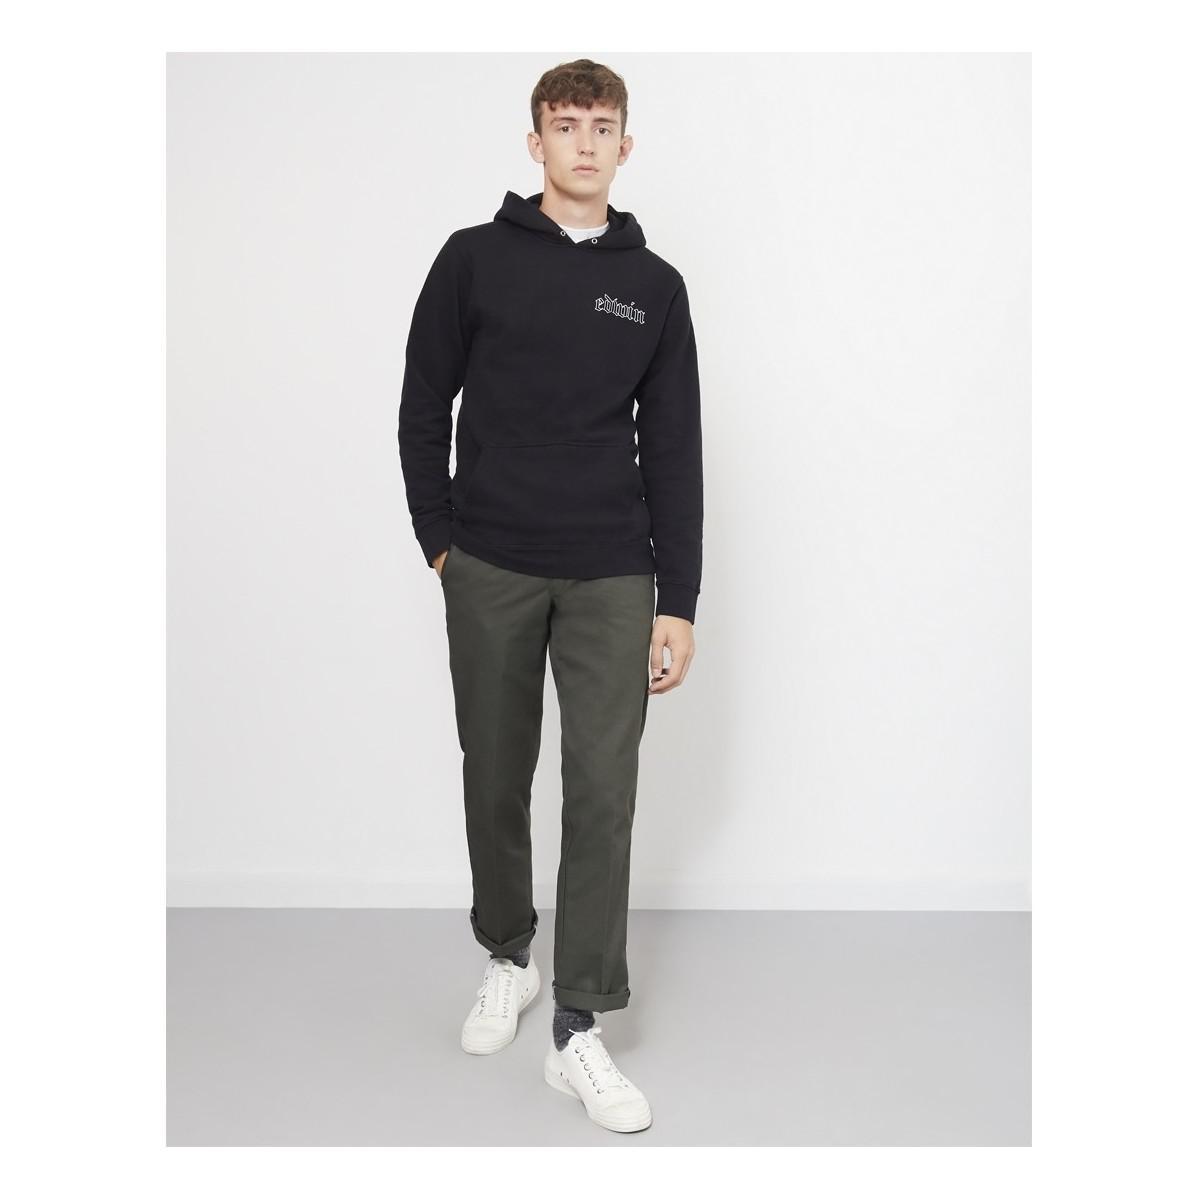 Edwin Cotton Best Or Nothing Hoodie Sweatshirt Black for Men